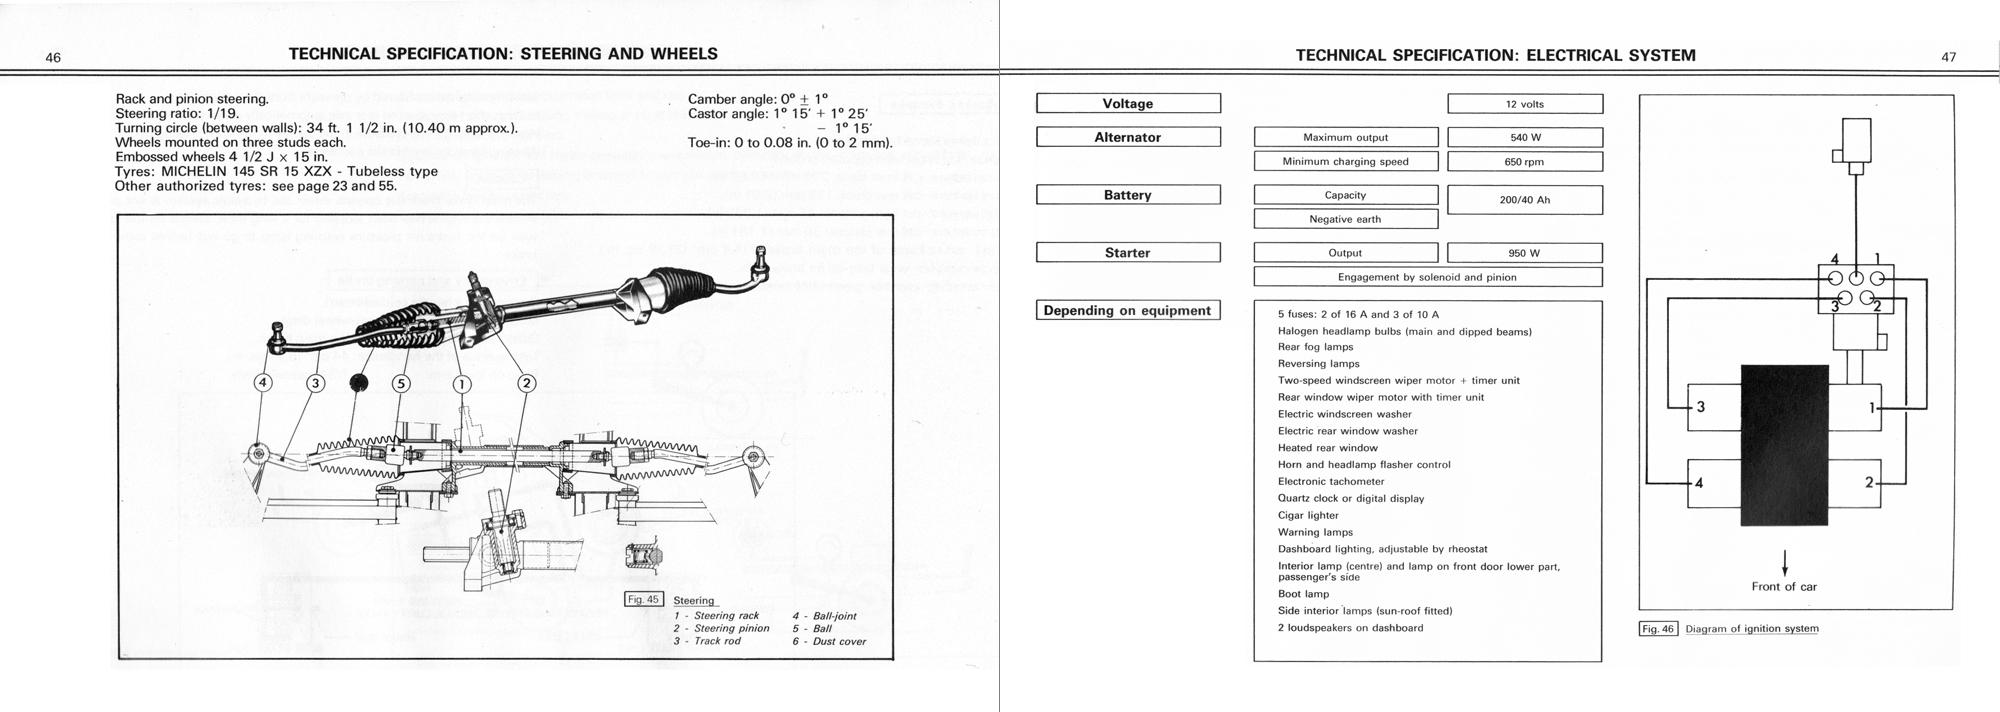 1982 Citroën GSA owner's manual Page 2/title>